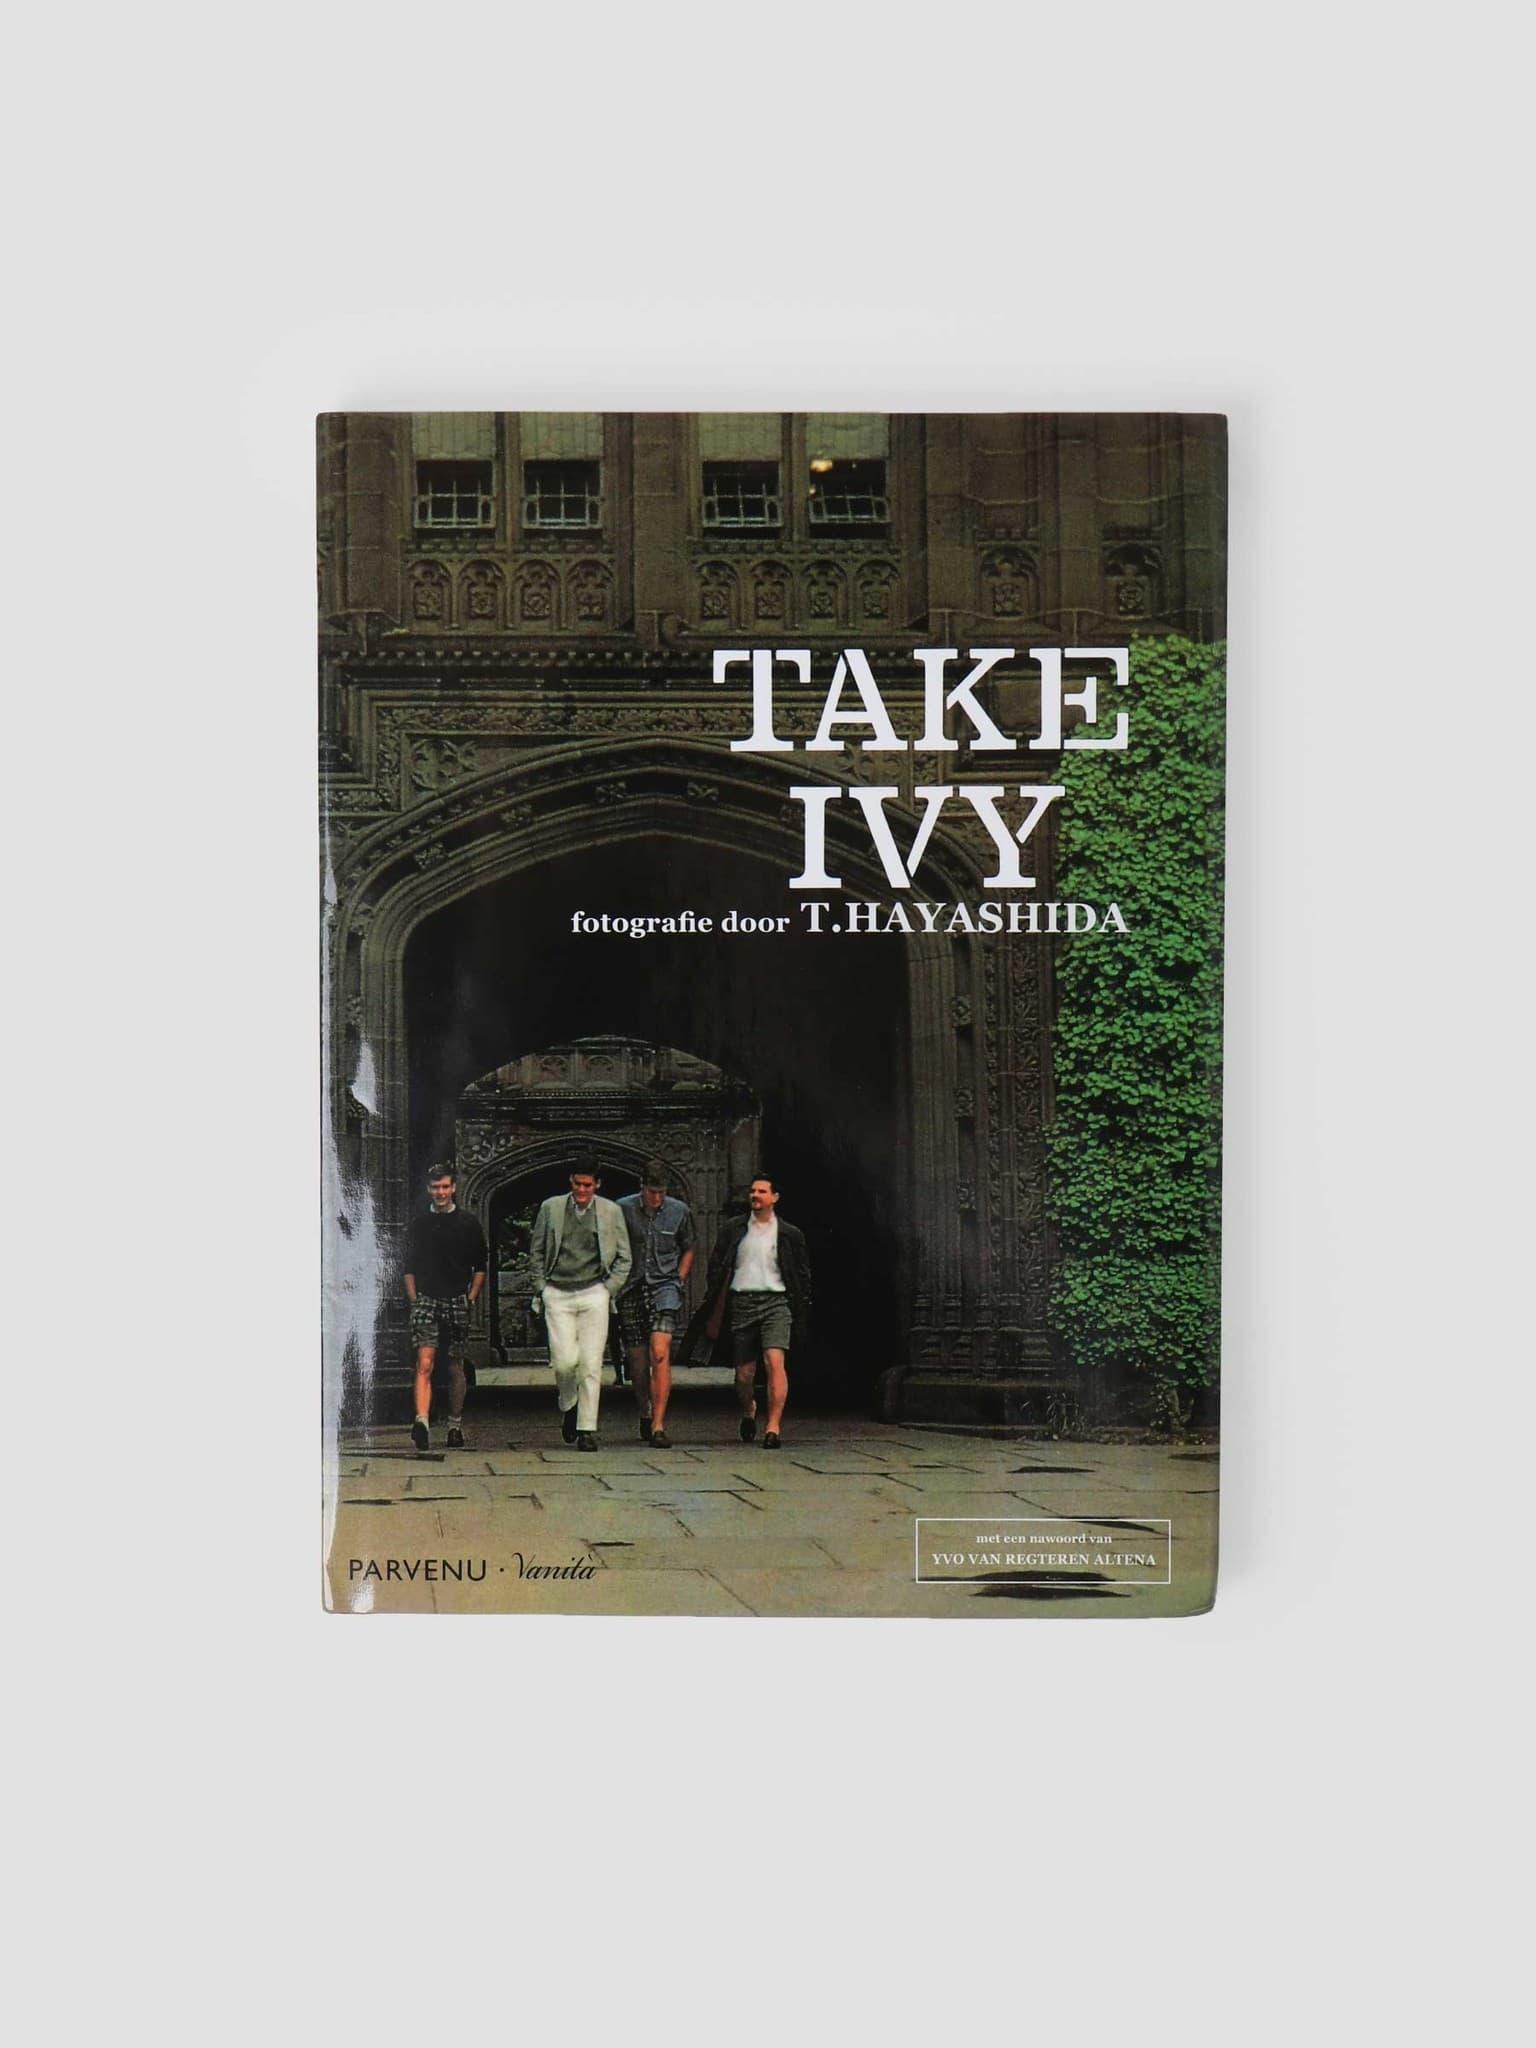 Take Ivy by T. Hayashida